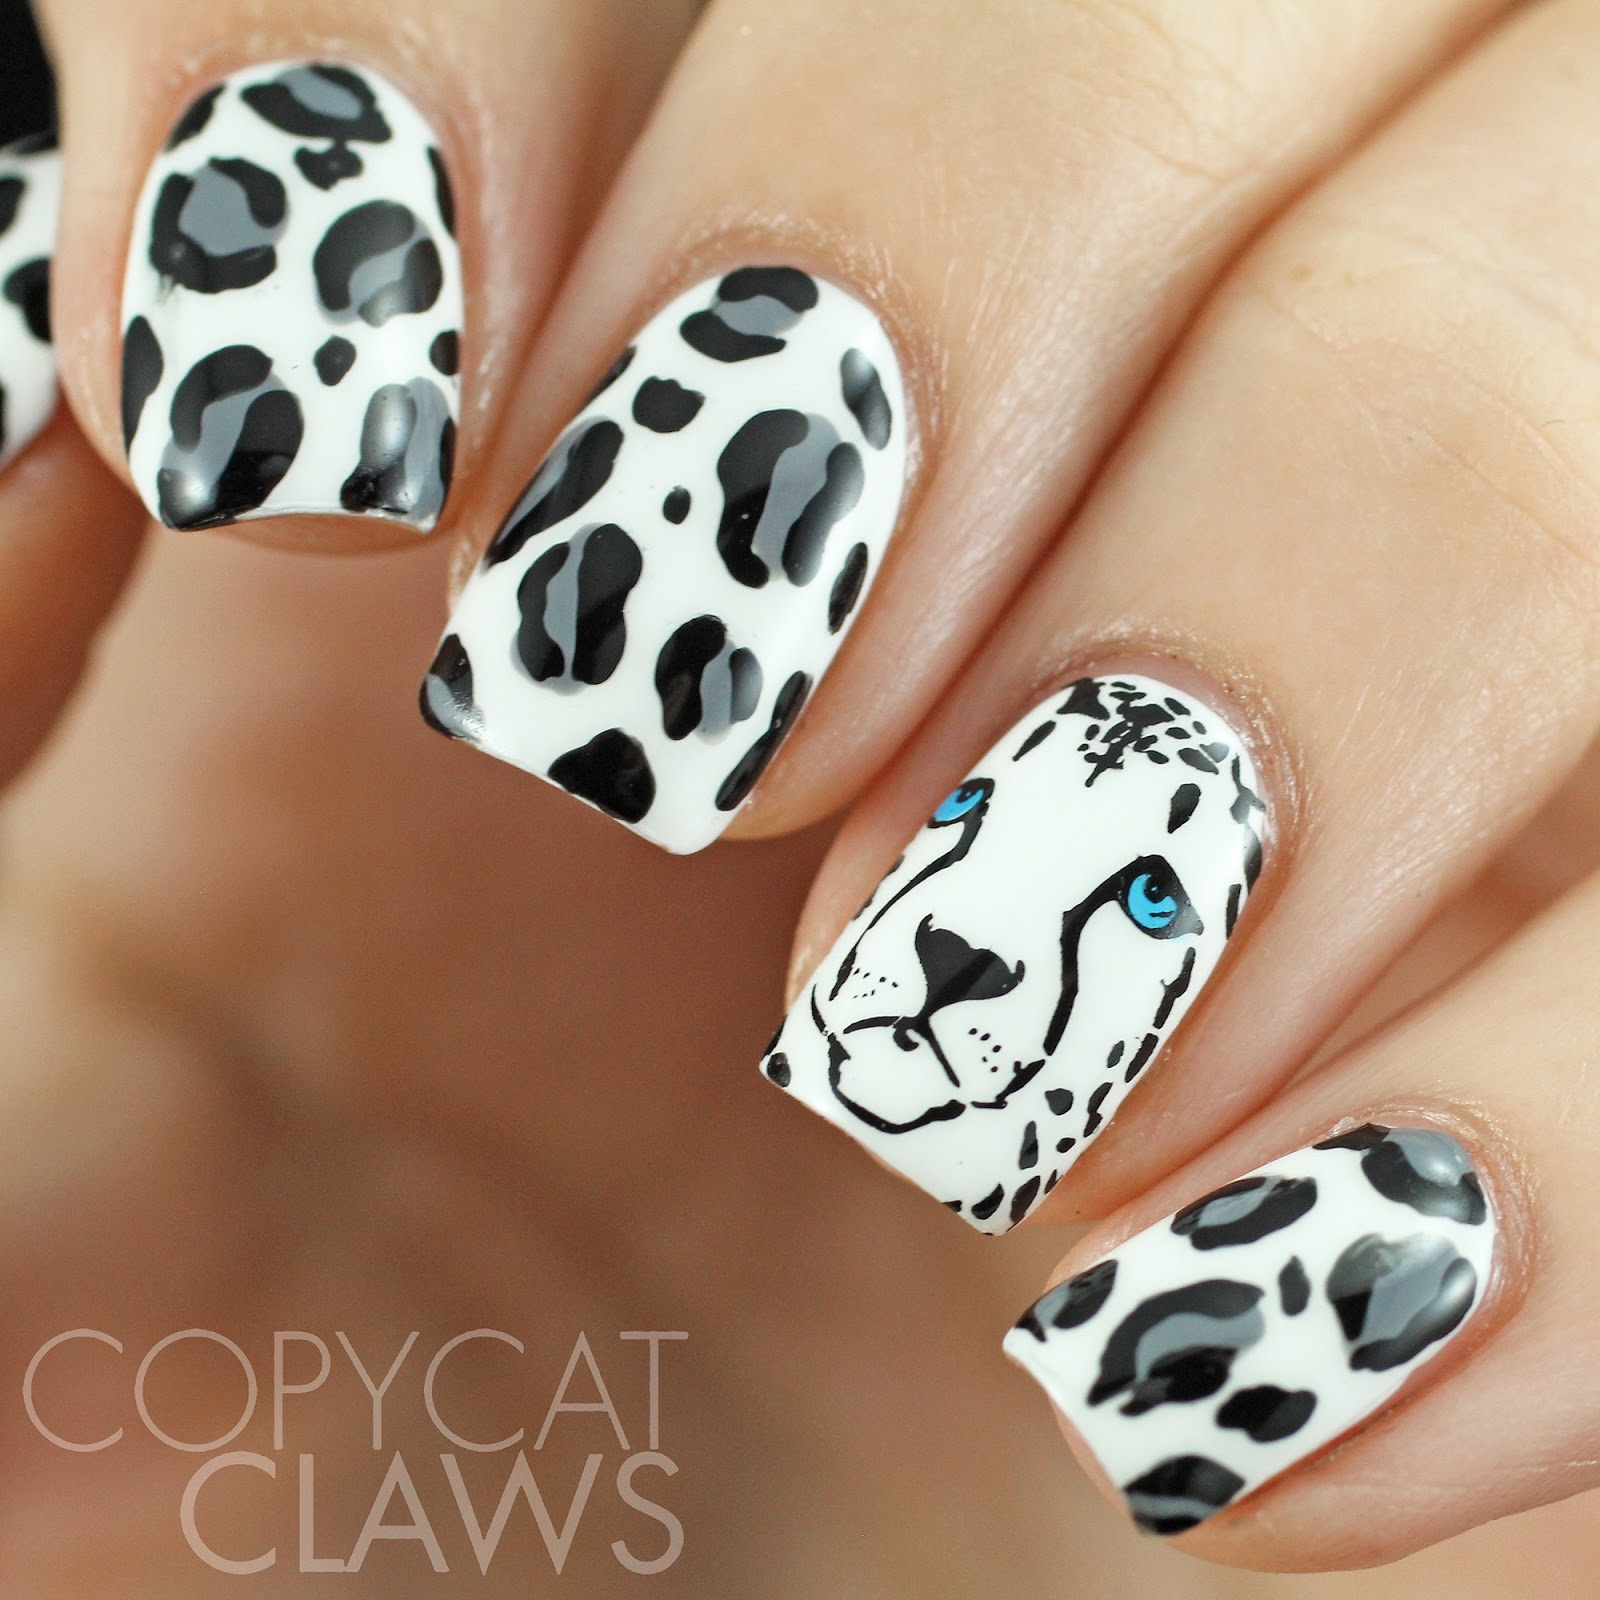 Diy Snow Leopard Nail Art: Copycat Claws: 40 Great Nail Art Ideas